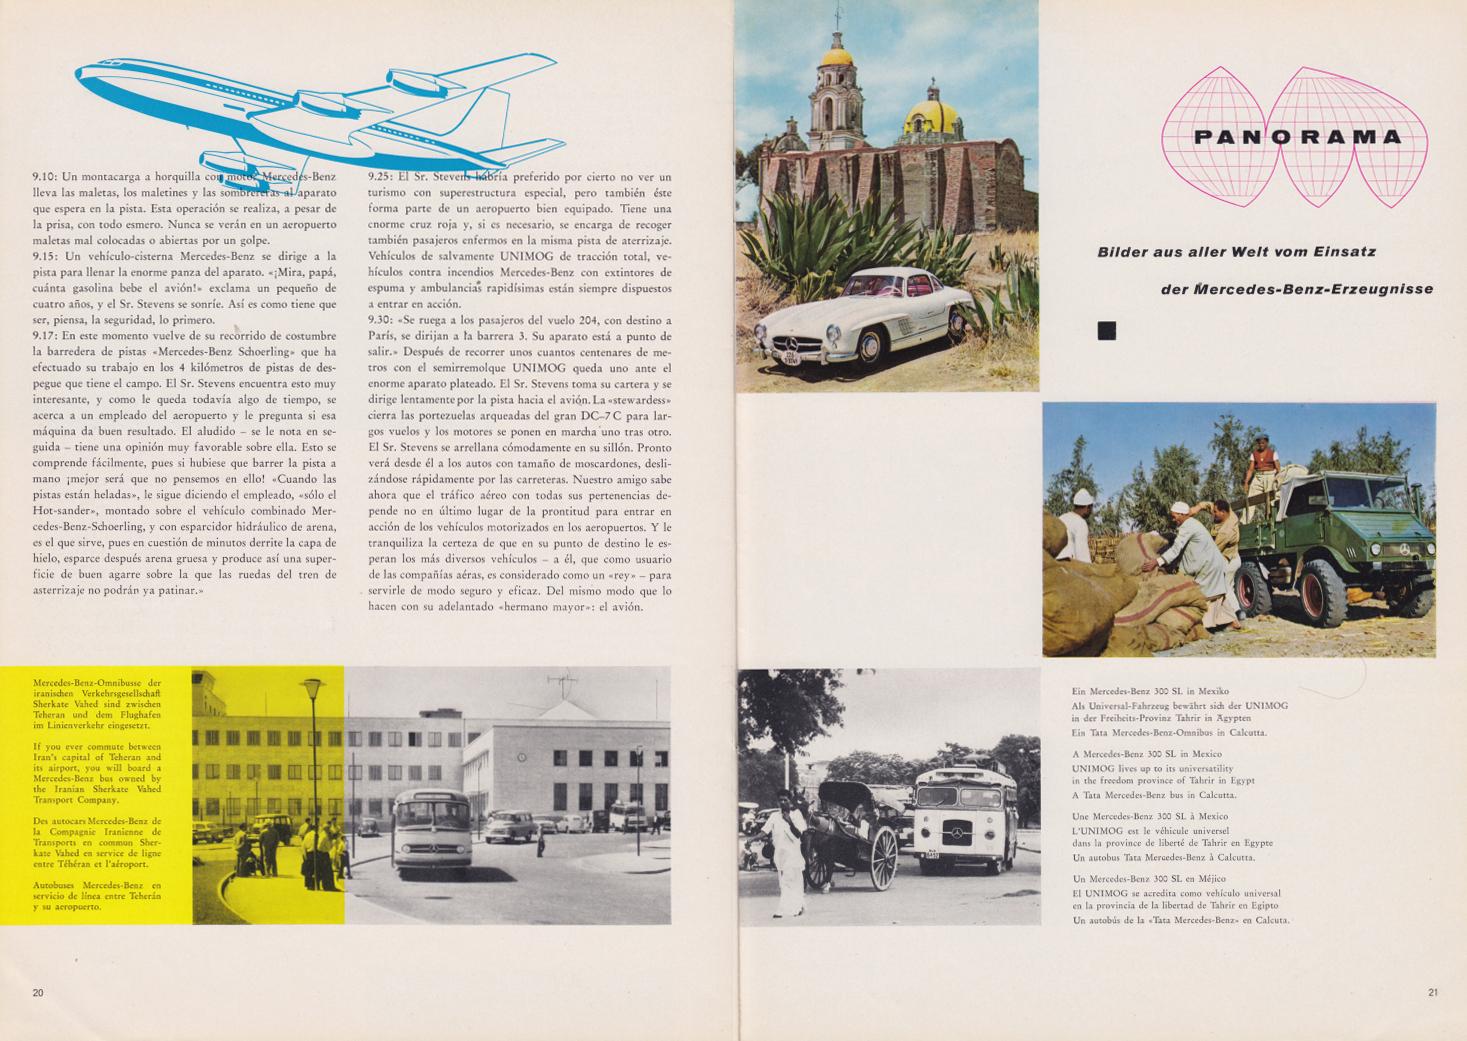 (REVISTA): Periódico In aller welt n.º 30 - Mercedes-Benz no mundo - 1959 - multilingue 011